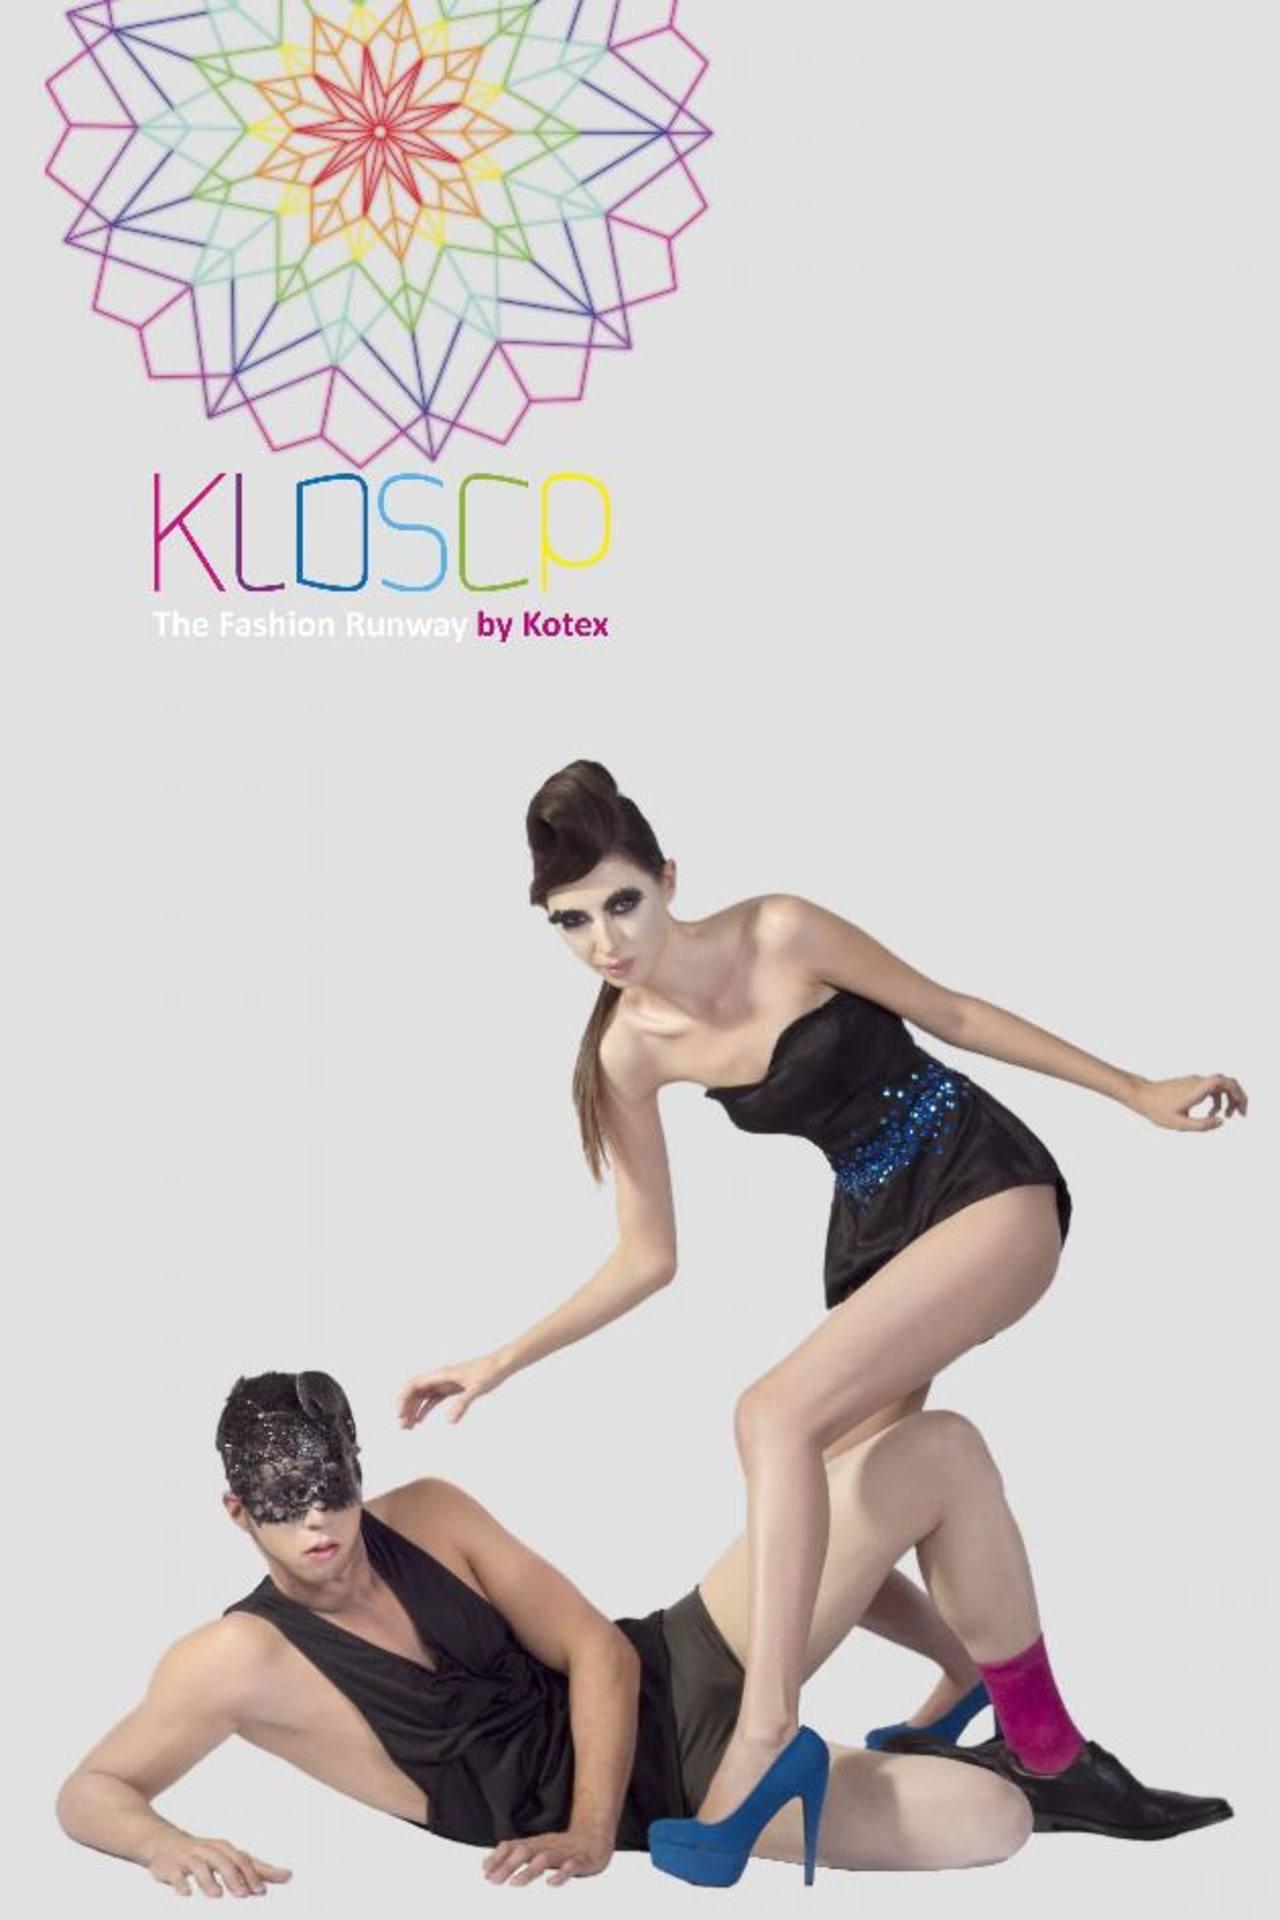 KLDSCP 13 La moda emergente